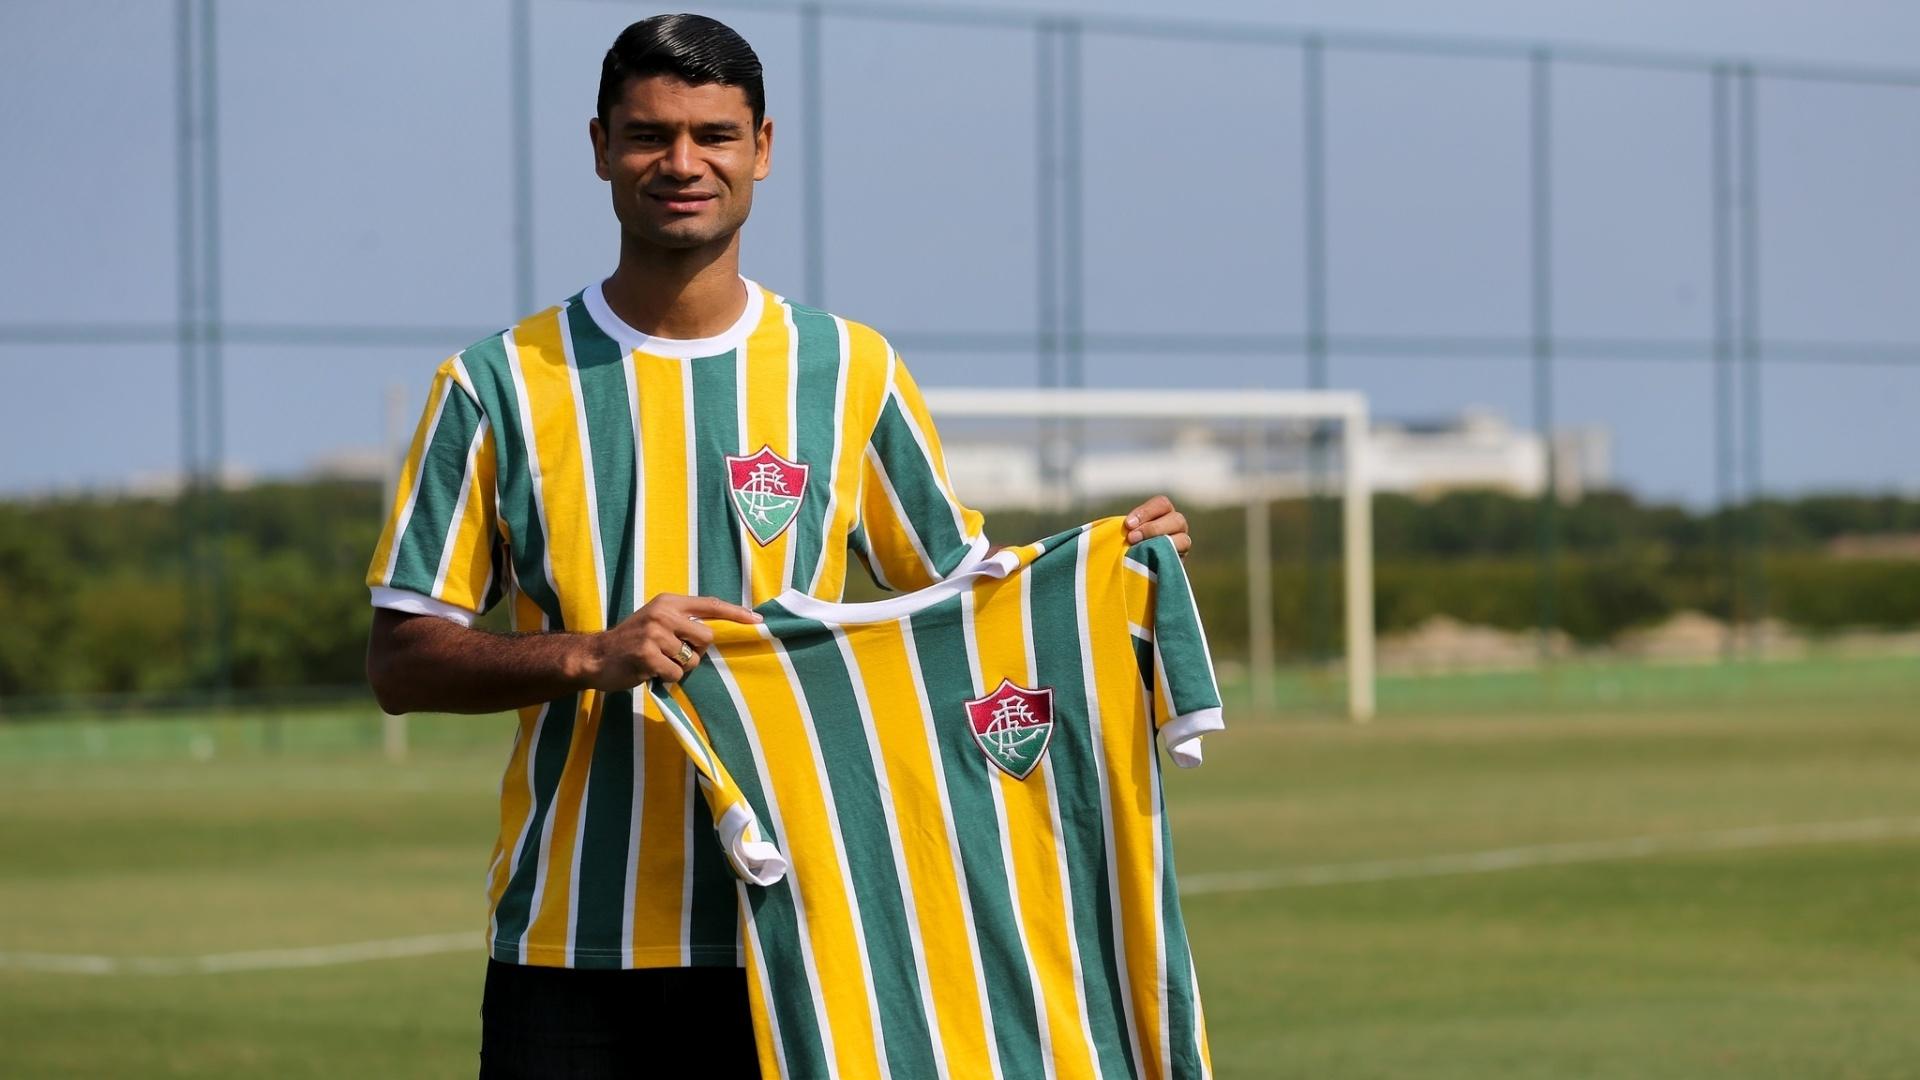 O zagueiro Gum apresenta a camisa especial do Fluminense para a Copa do Mundo